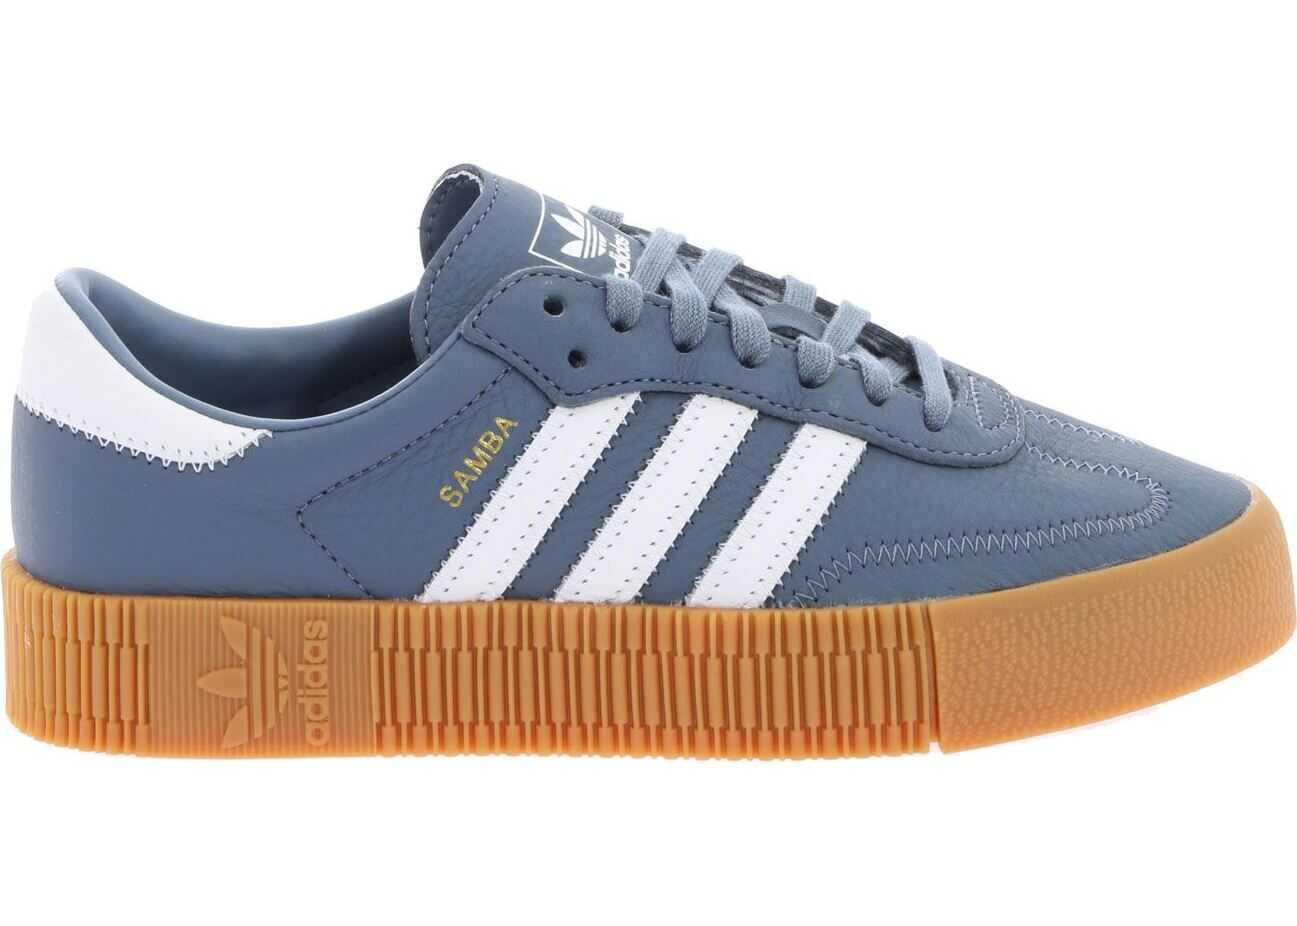 adidas Adidas Originals Sambarose Sneakers In Light Blue Light Blue